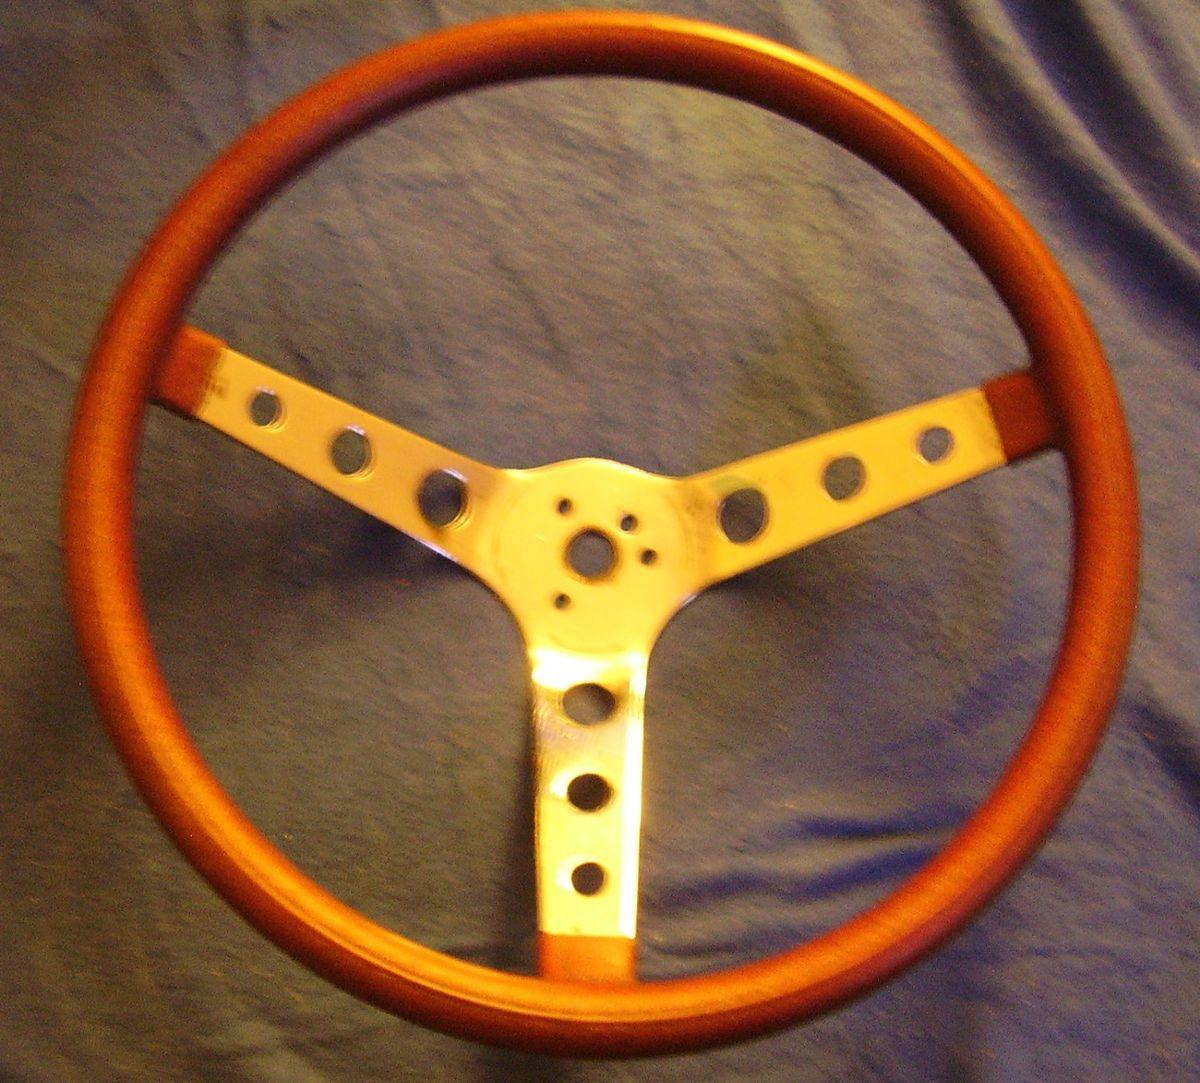 14 5 Red Metalflake Rim Steering Wheel Moon Hot Rat Rod Used Patina